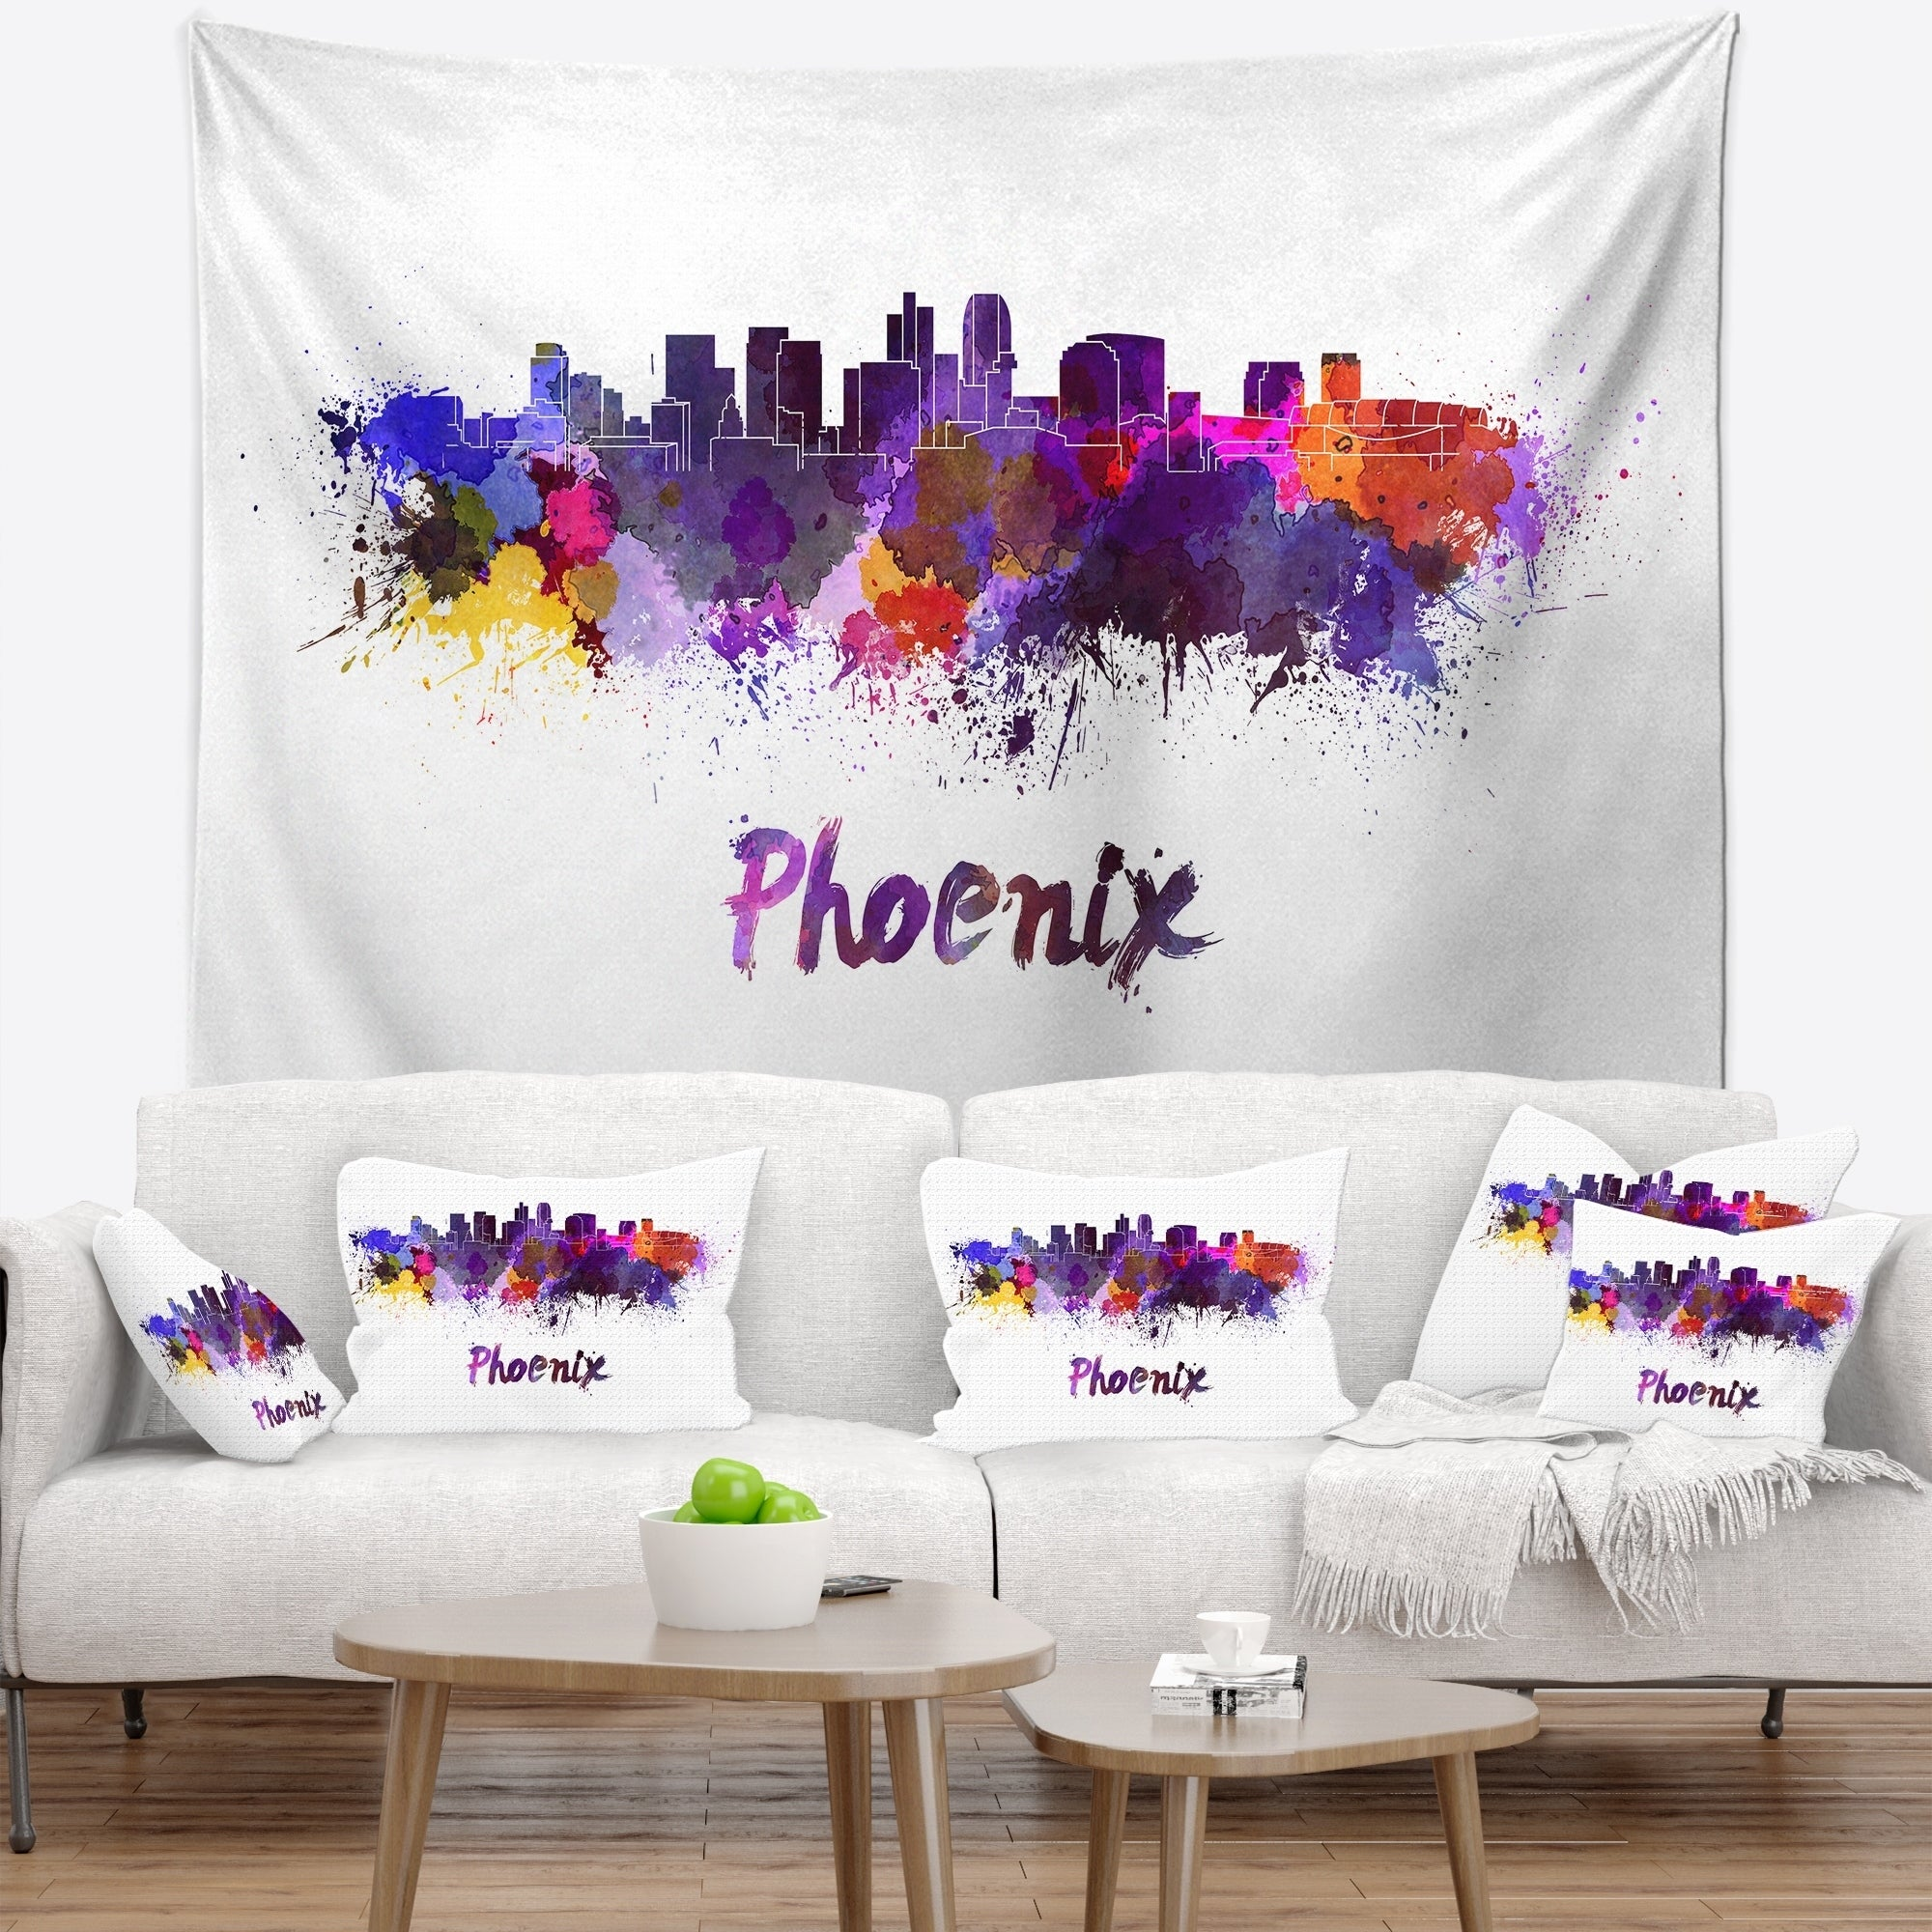 Designart 'Phoenix Skyline' Cityscape Wall Tapestry